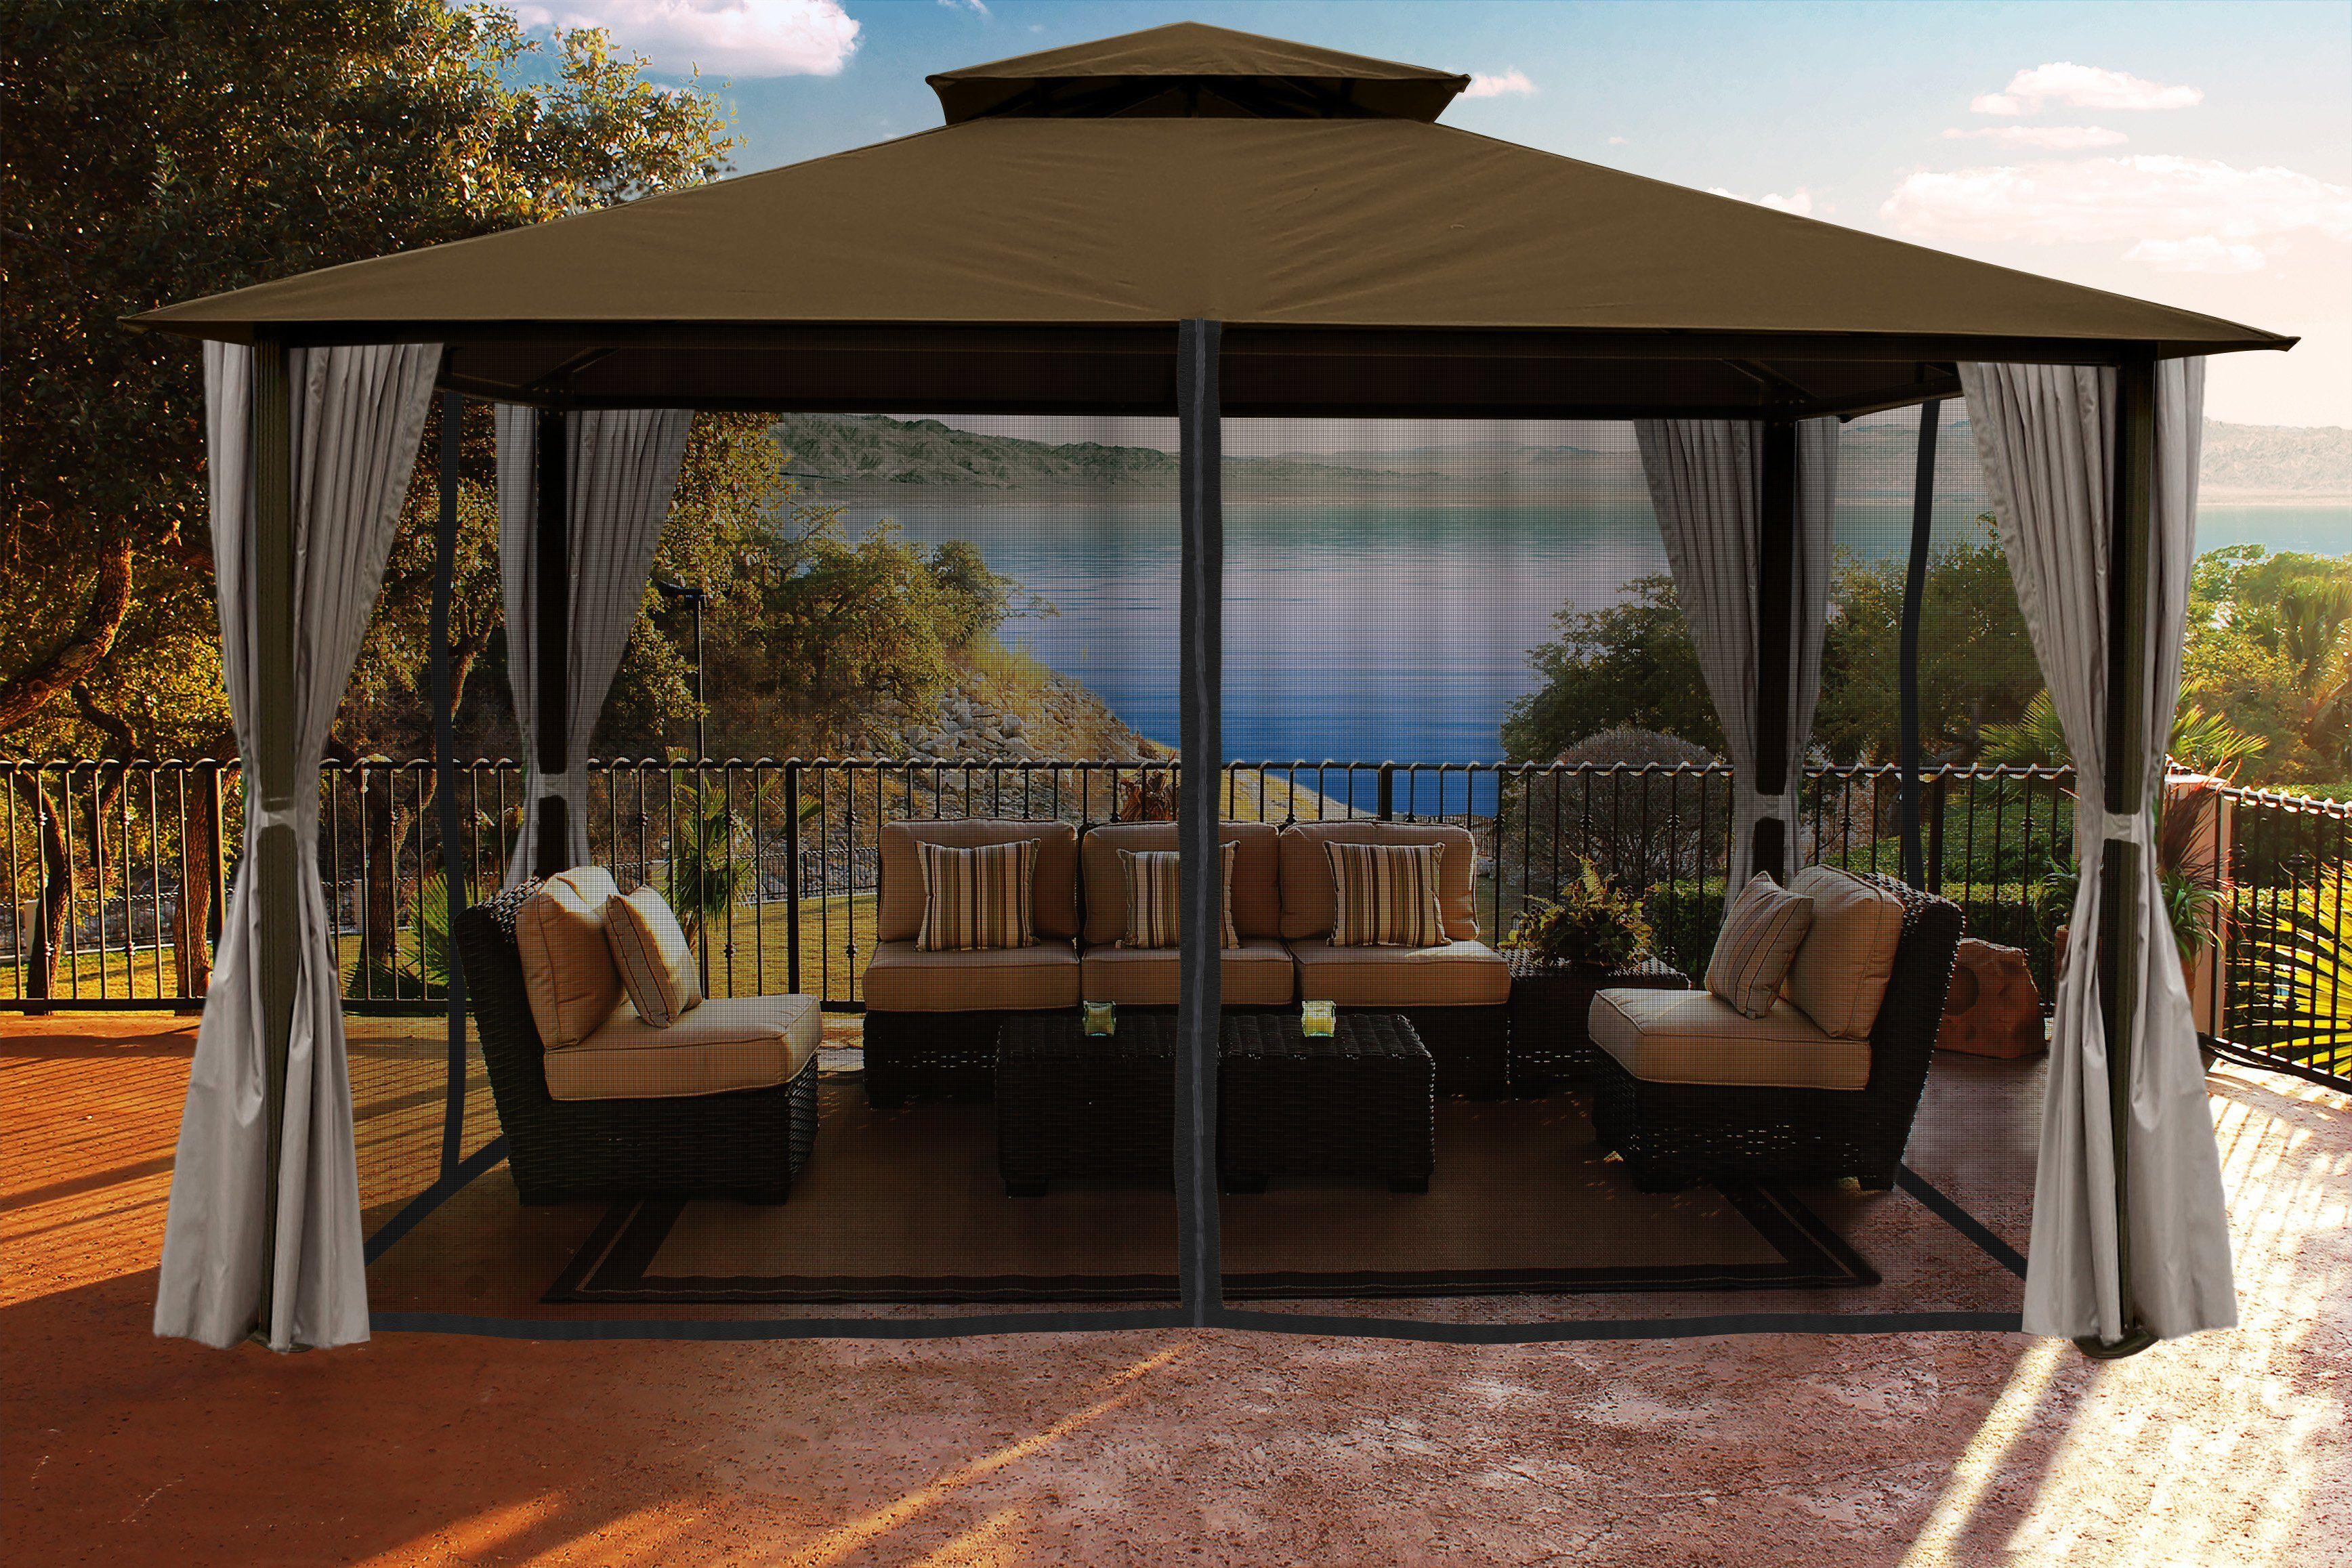 Gazebo Penguin Solarium Sunroom Kit The Better Backyard Patio Modern Pergola